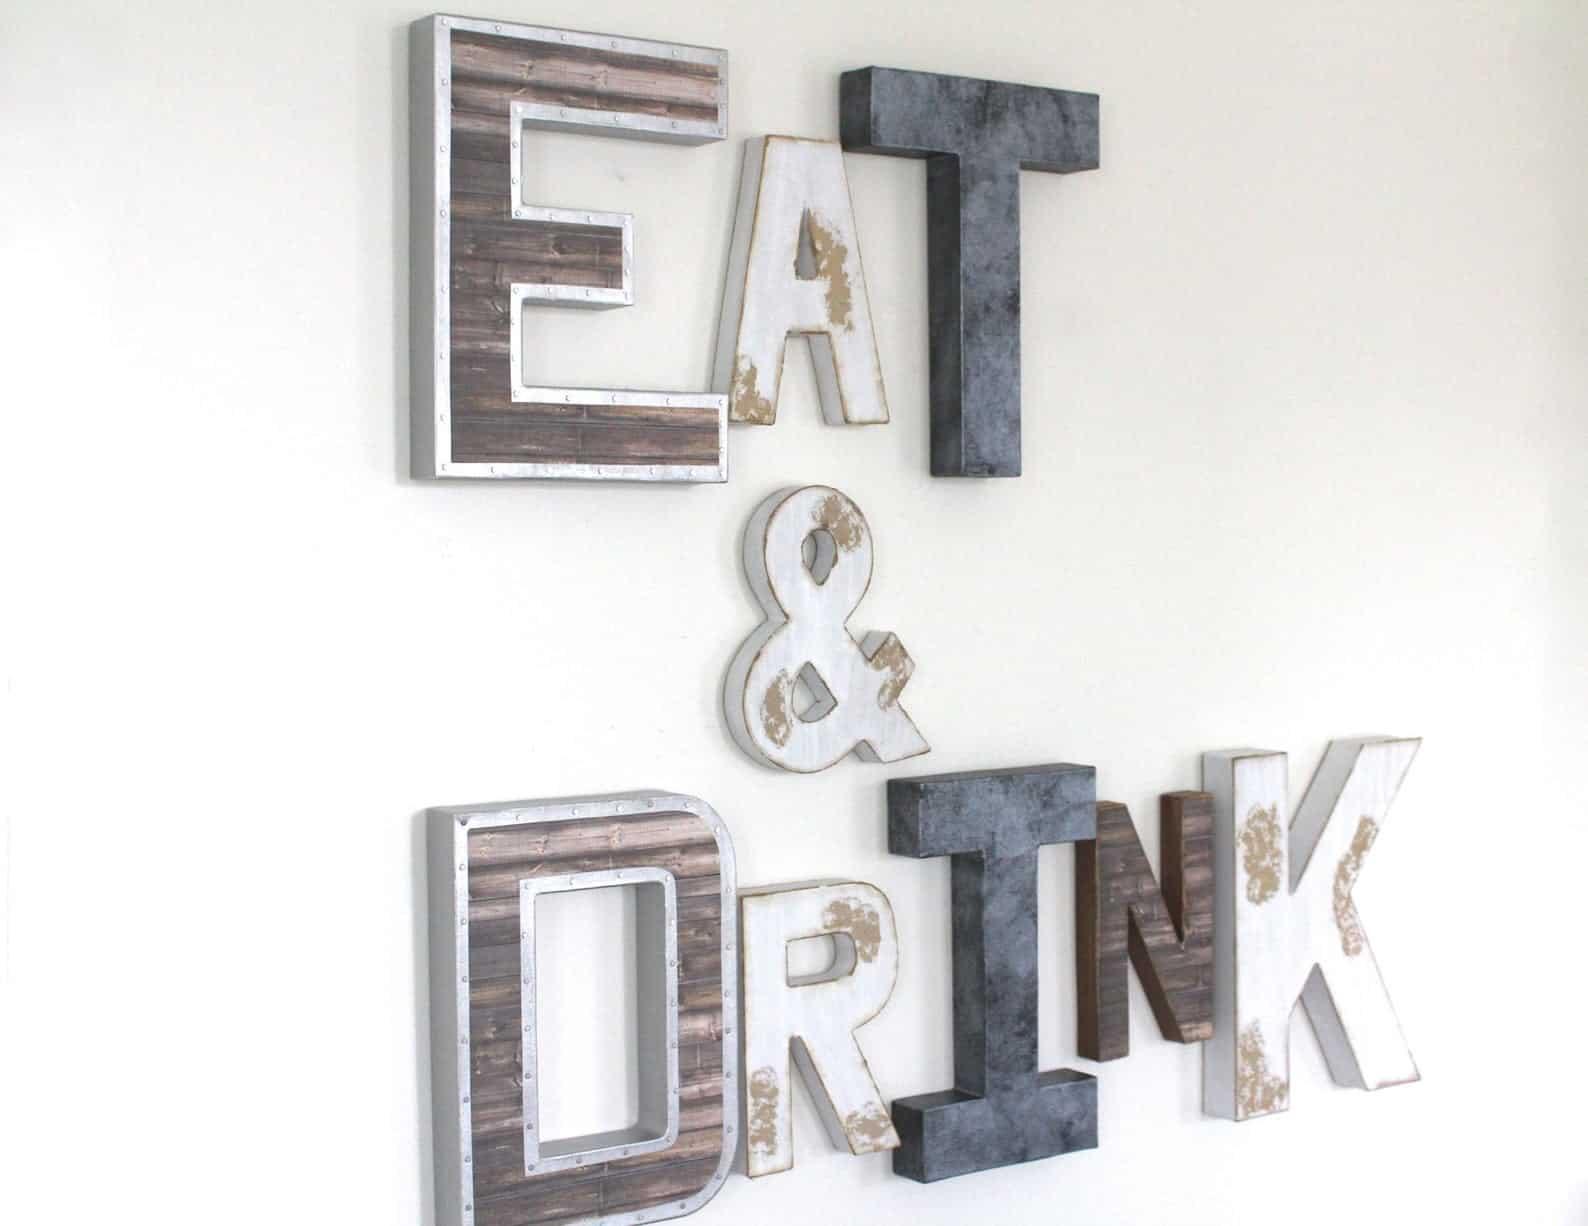 Eat & drink industrial sign